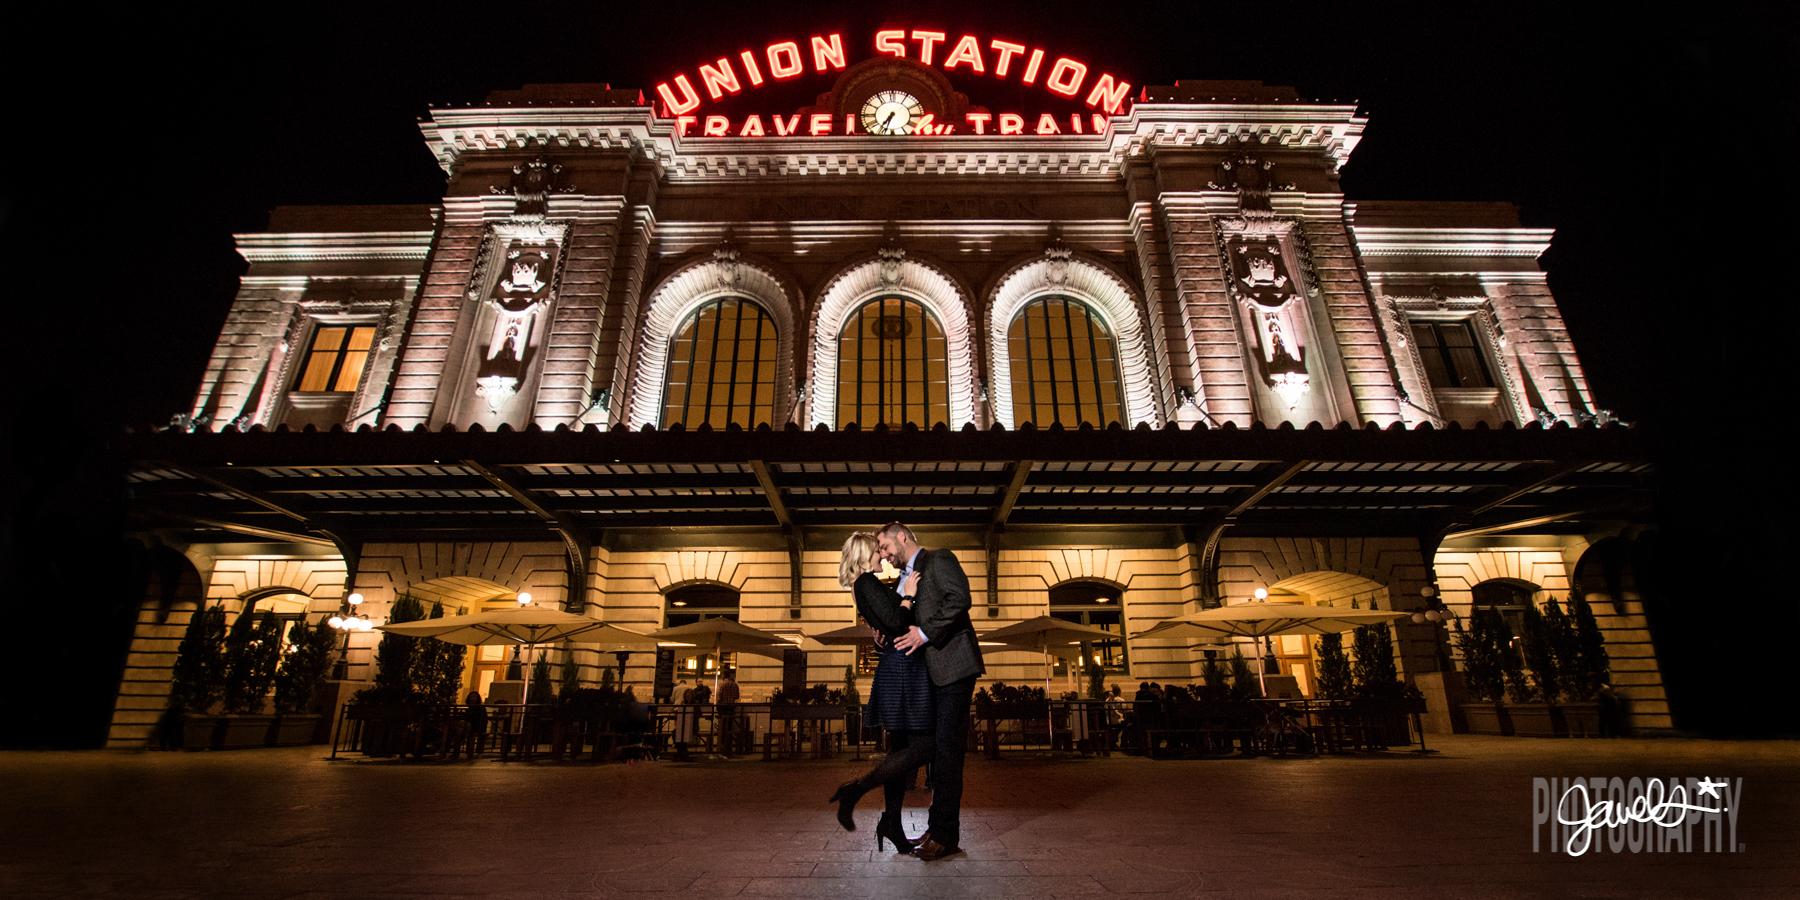 denver union station engagement at night